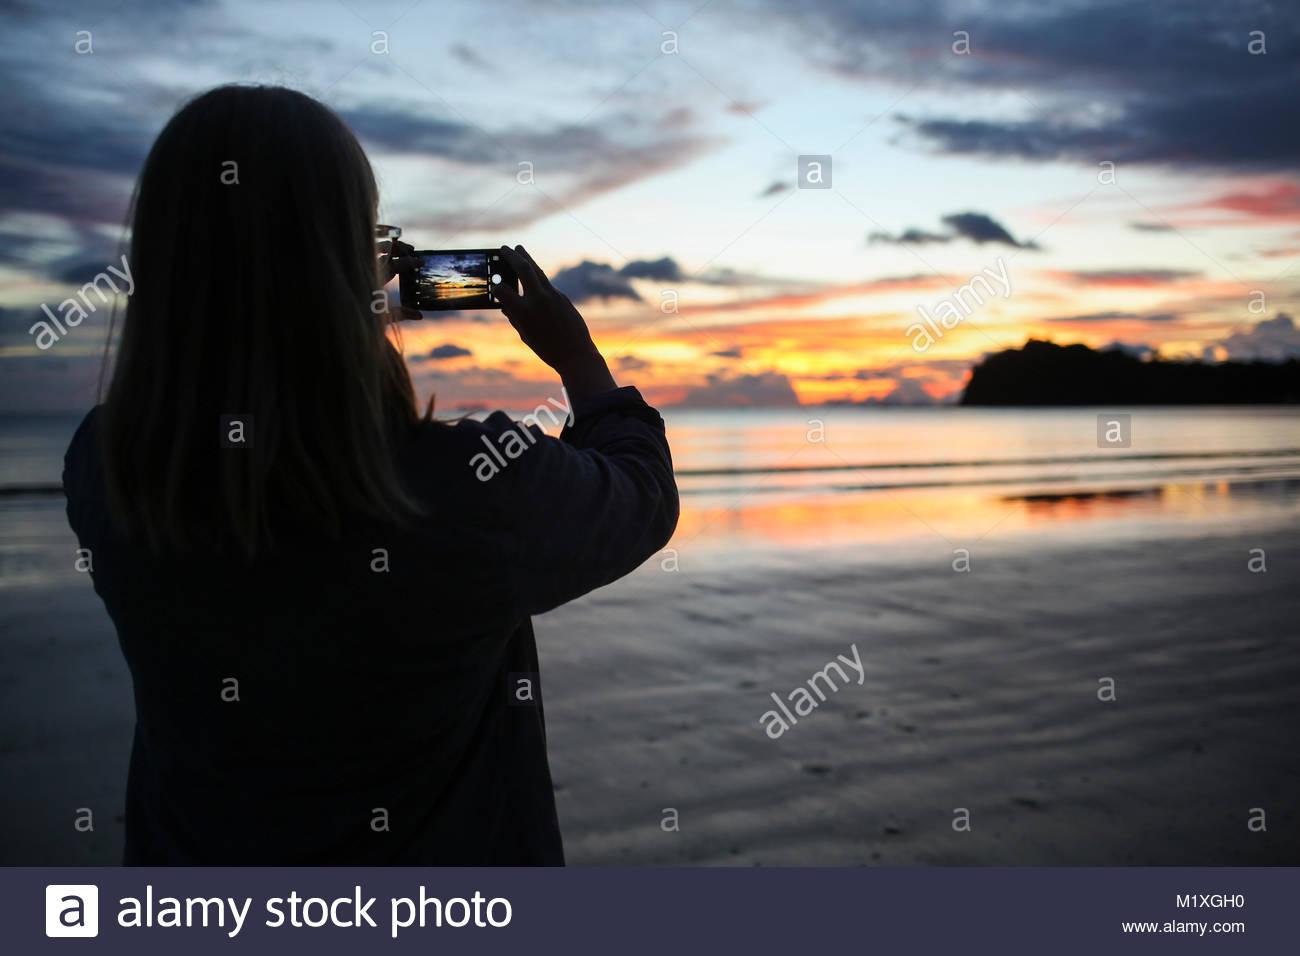 Woman taking photograph of beach during sunset in Ko Lanta, Thailand - Stock Image